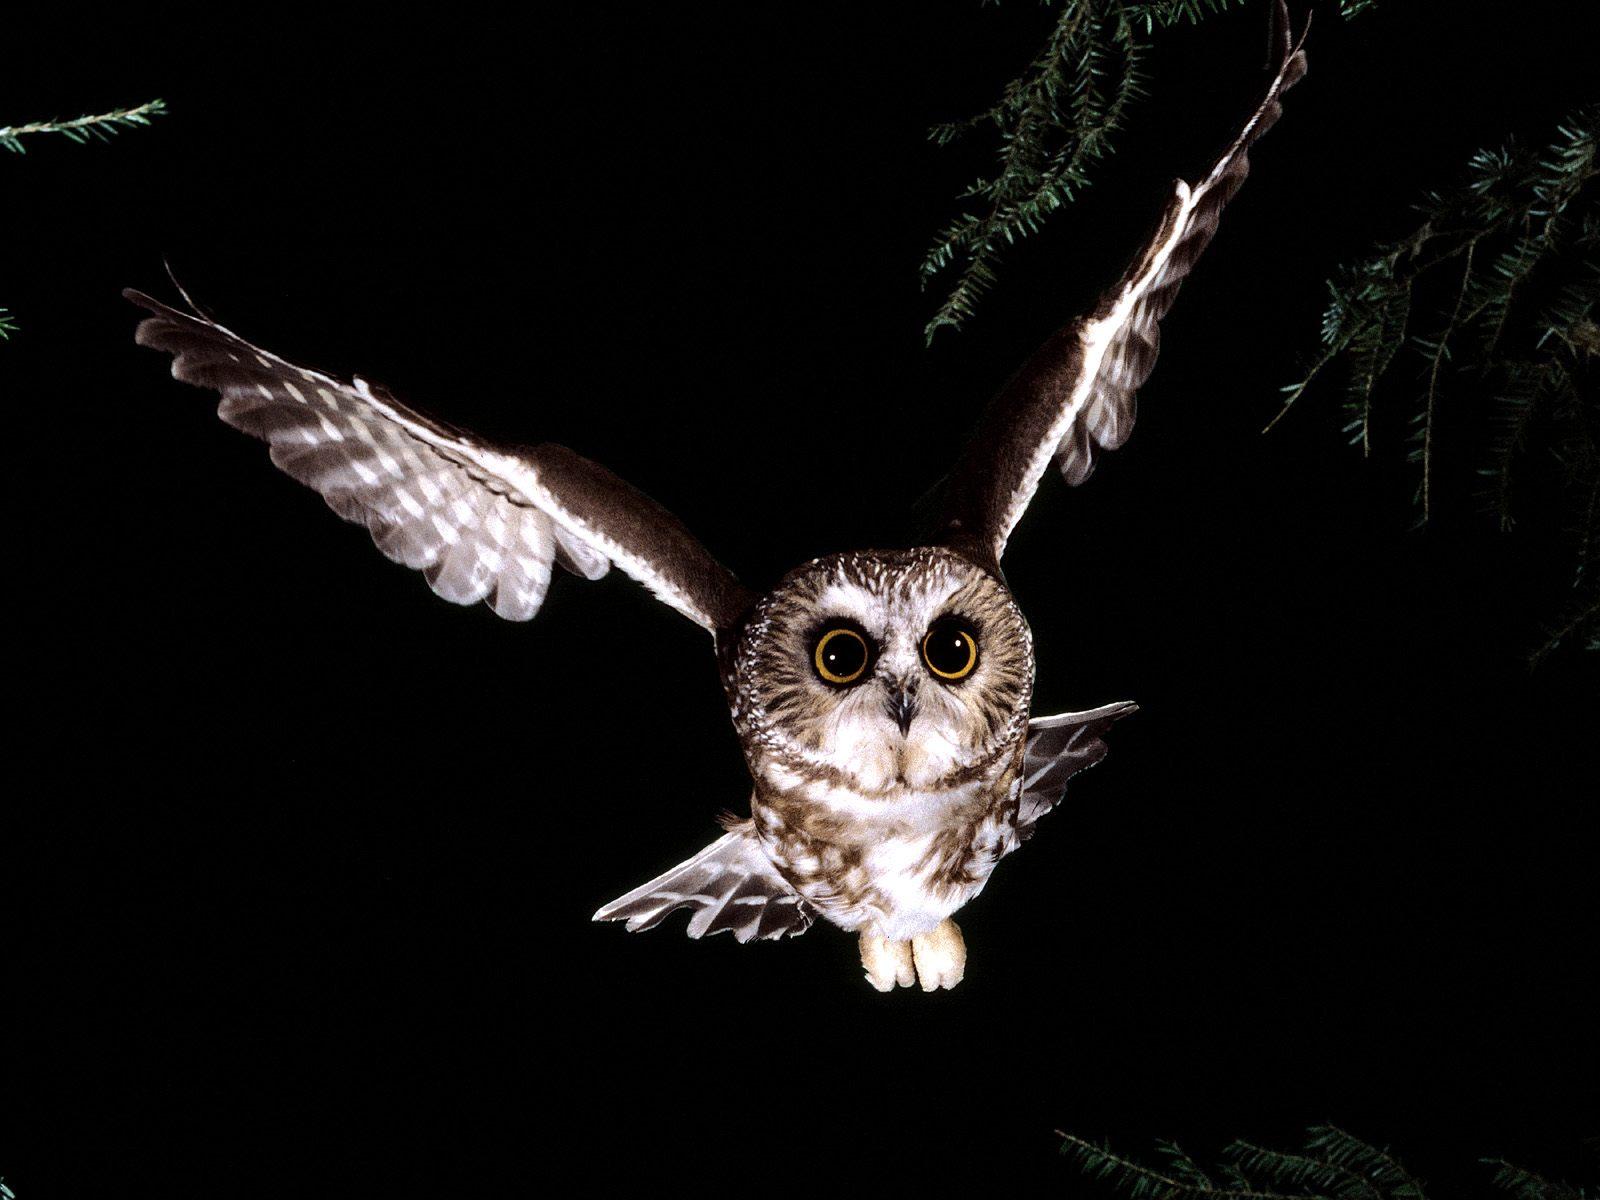 Owl Drk Wallpapers & Pics